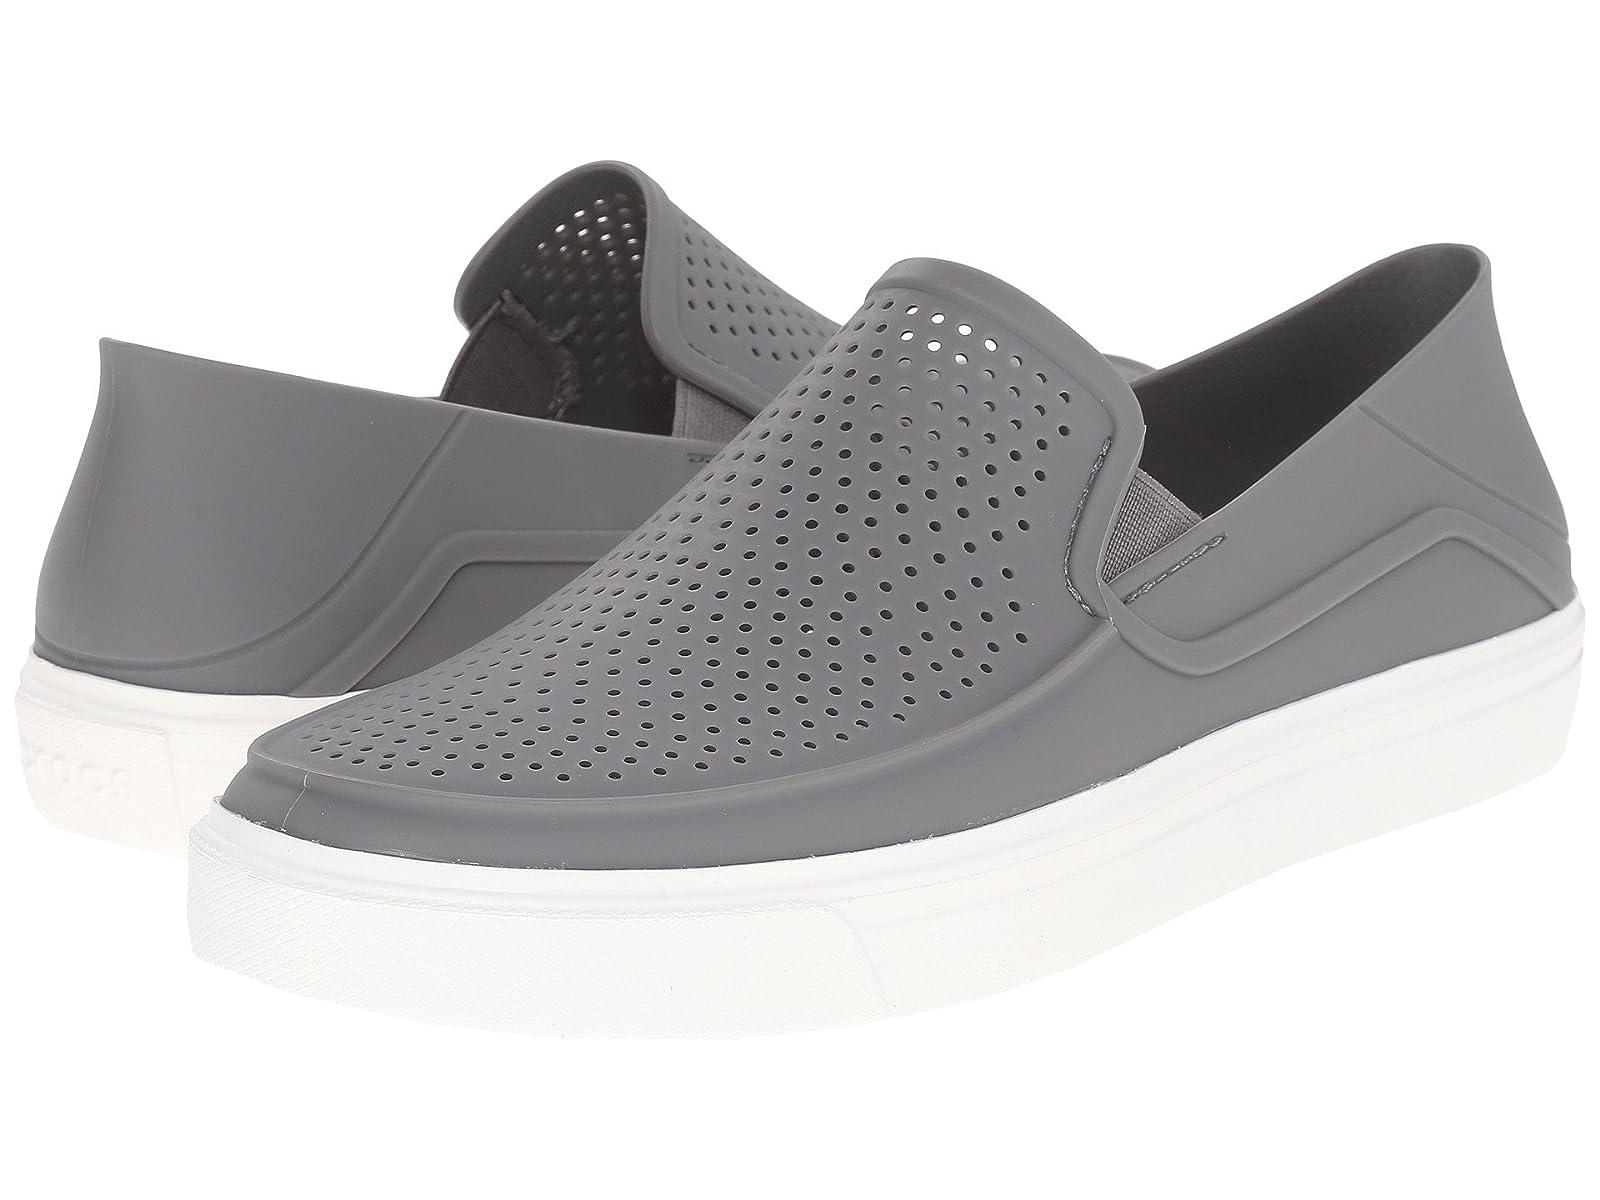 Crocs CitiLane Roka Slip-OnAtmospheric grades have affordable shoes